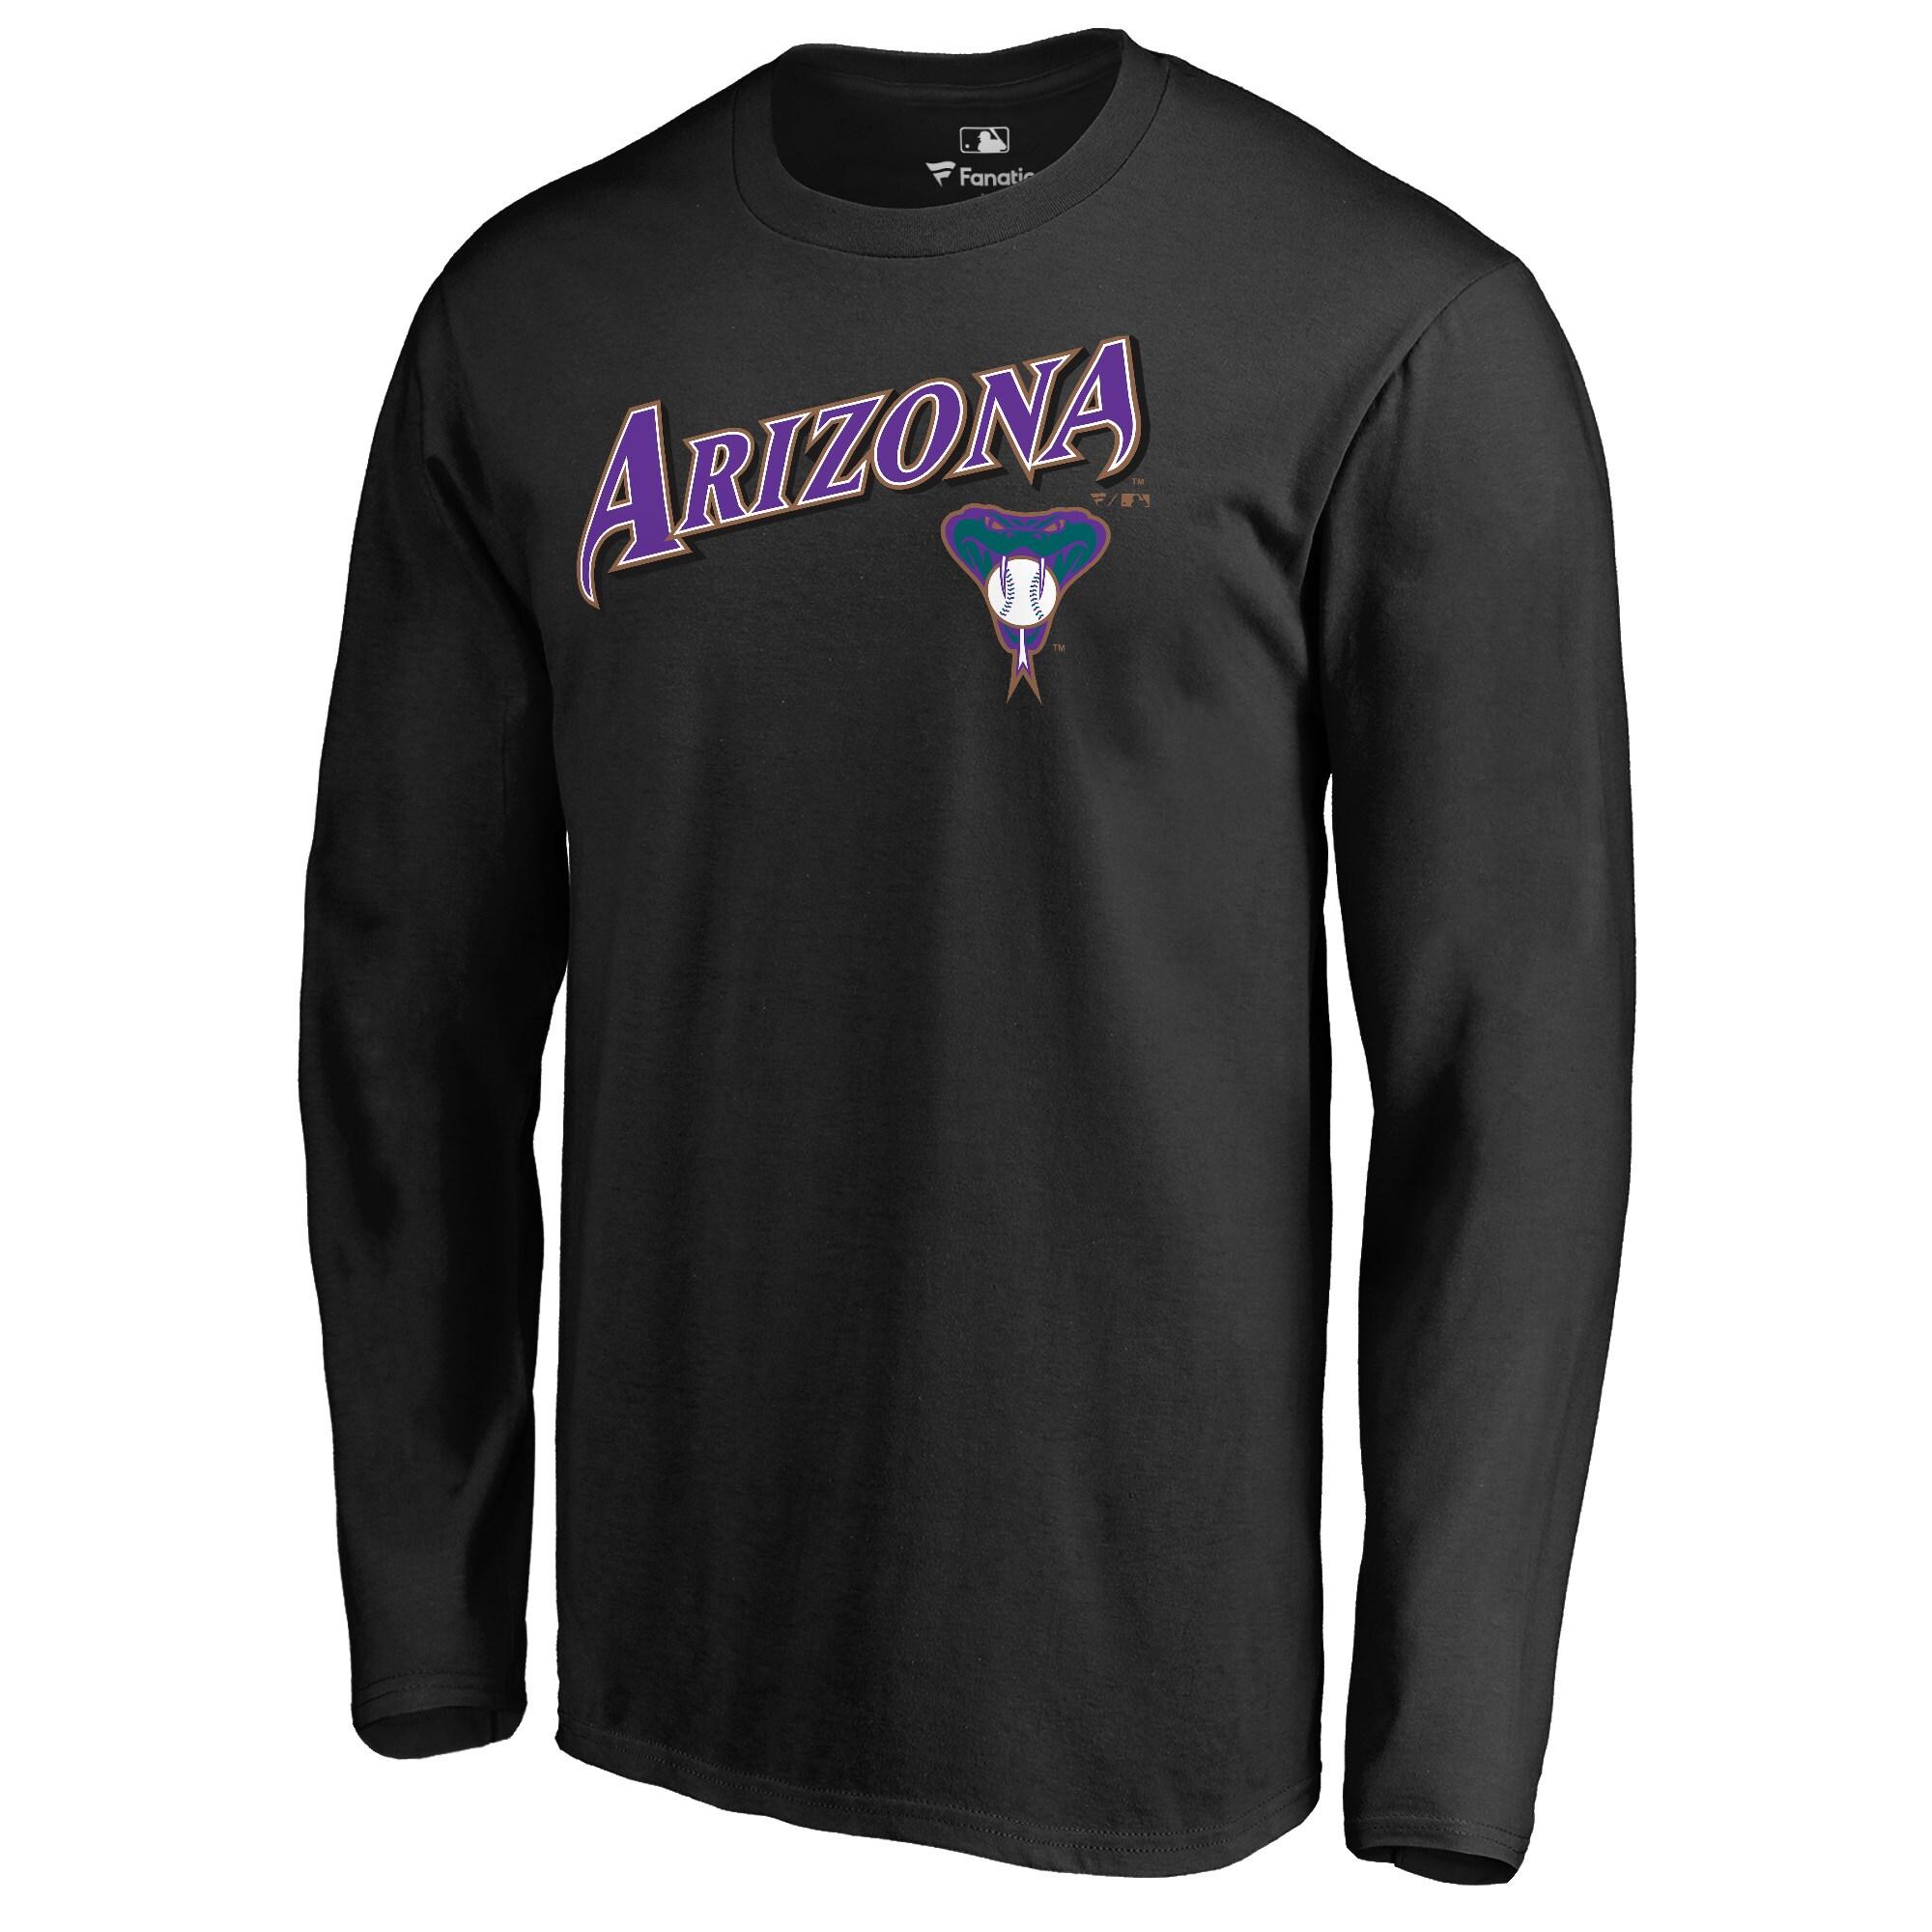 Arizona Diamondbacks Fanatics Branded Cooperstown Collection Wahconah Long Sleeve T-Shirt - Black